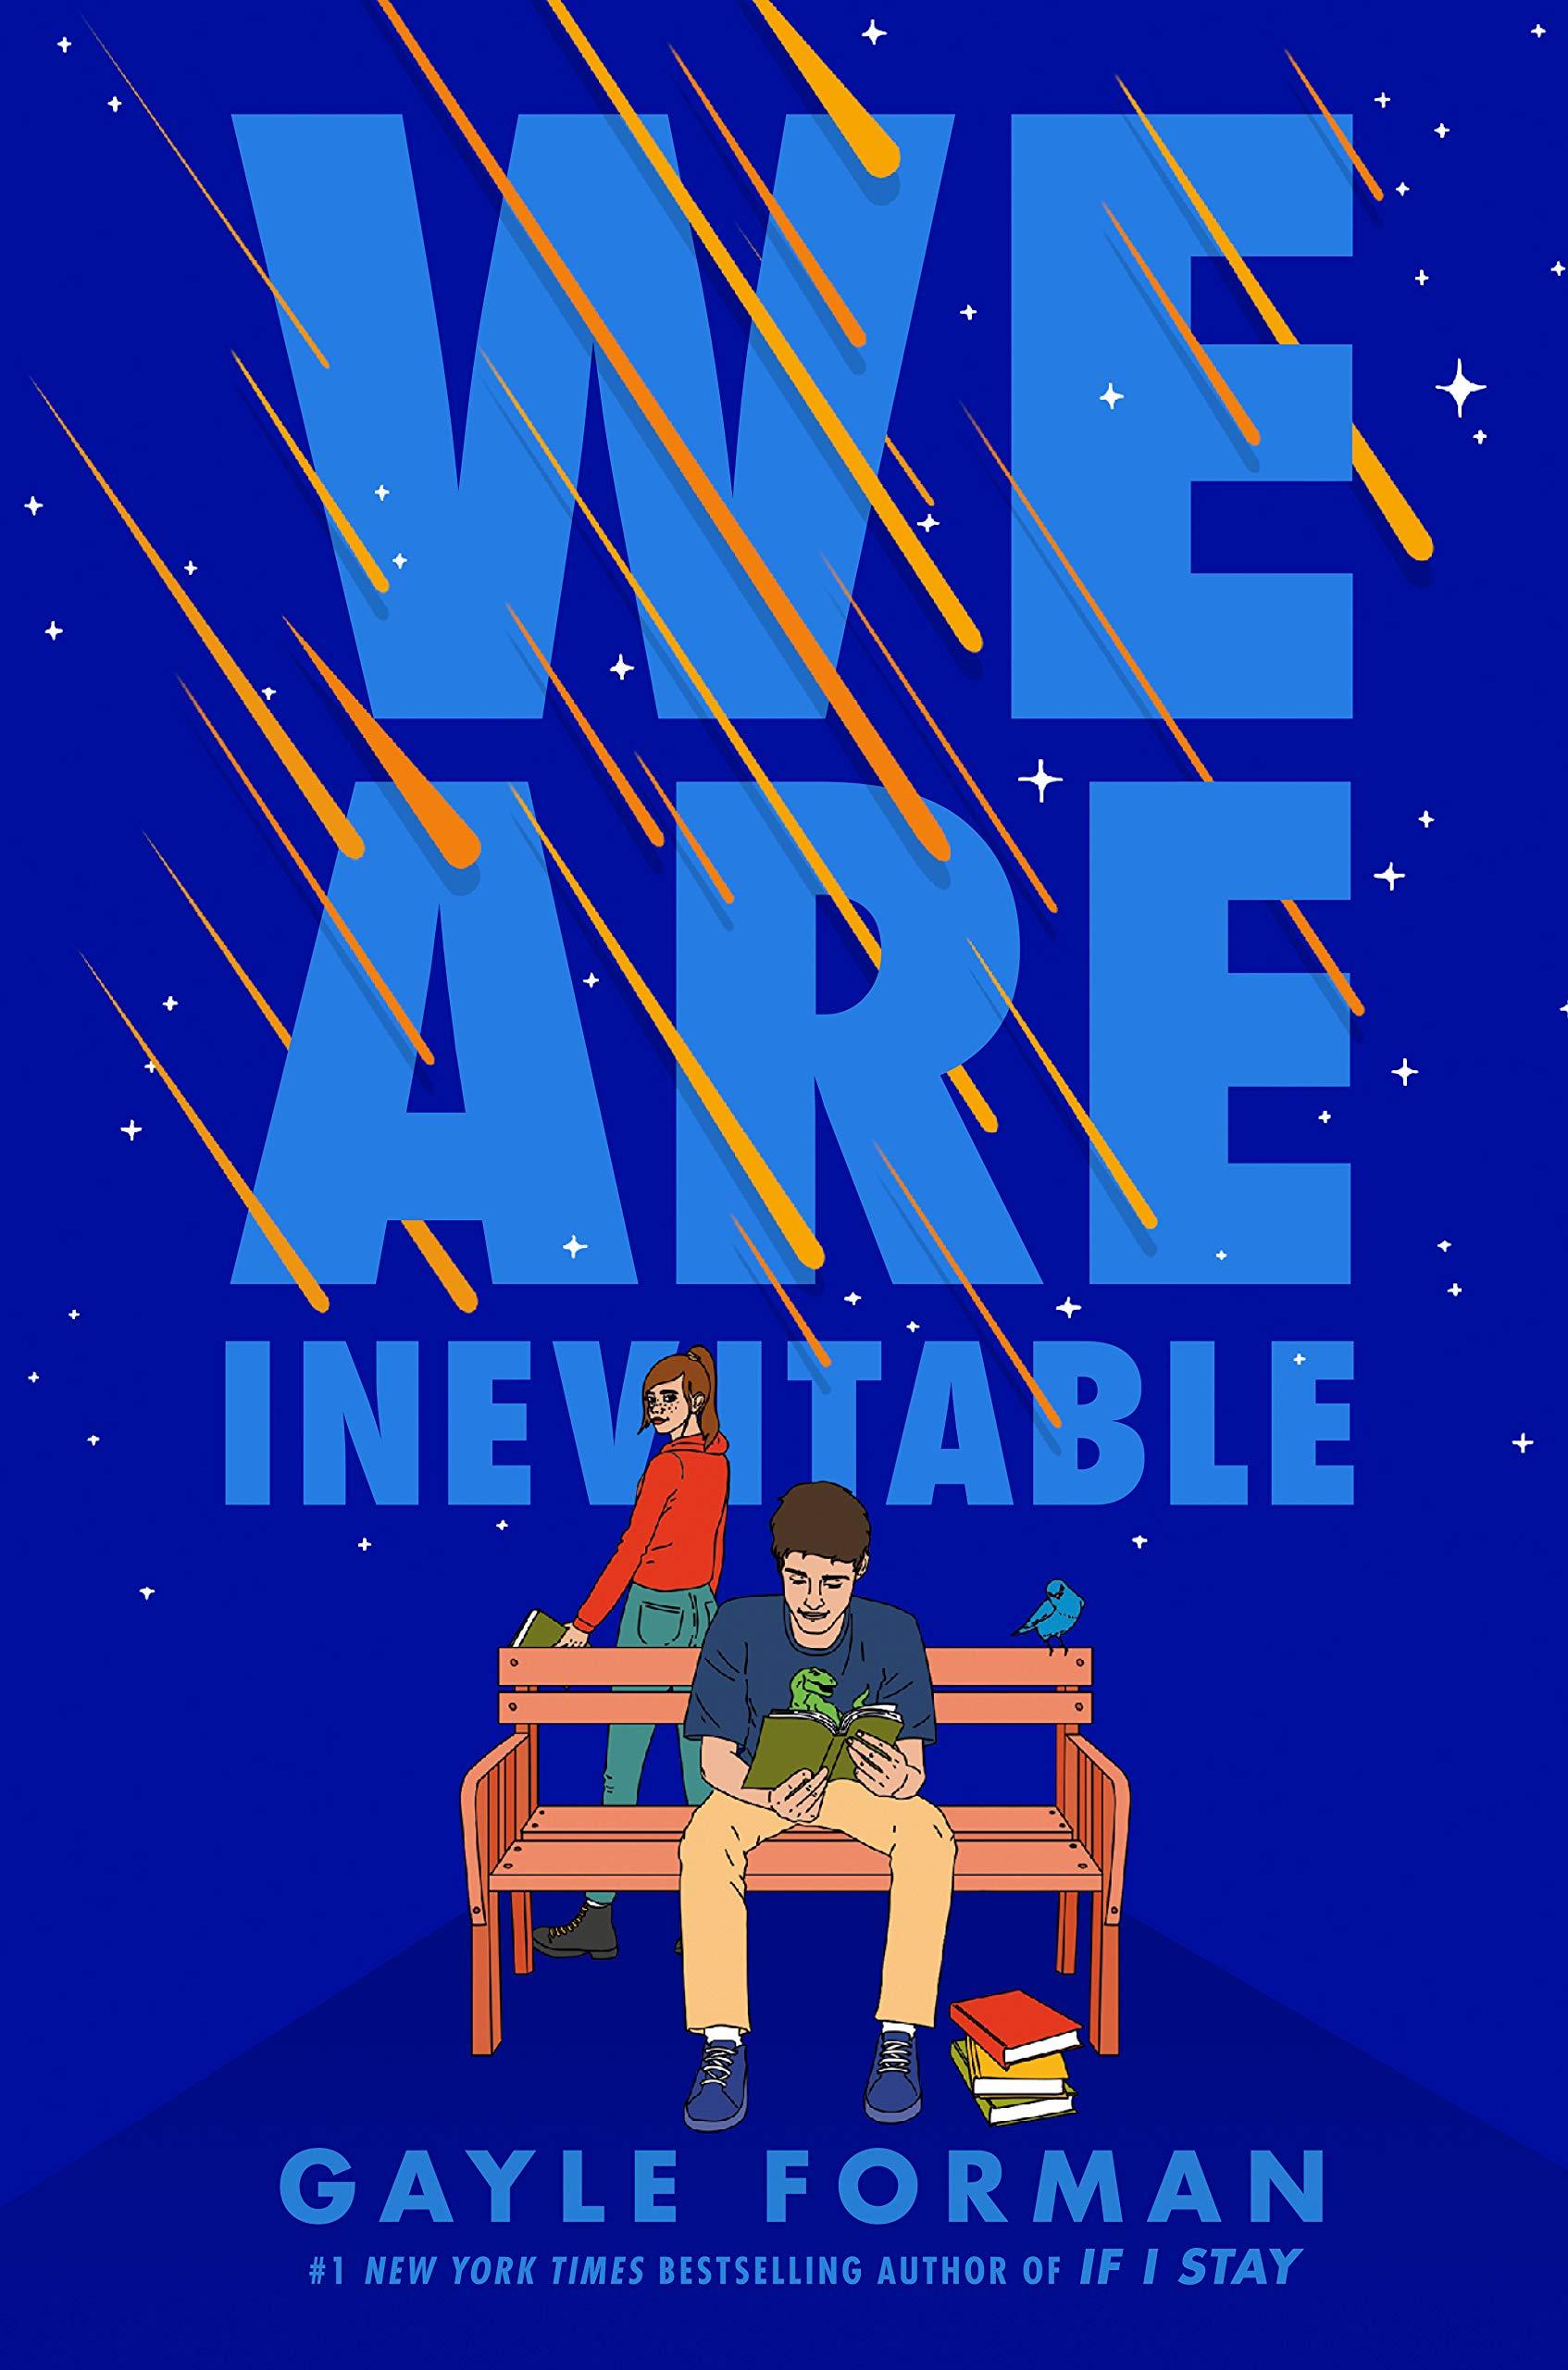 Amazon.com: We Are Inevitable (9780425290804): Forman, Gayle: Books